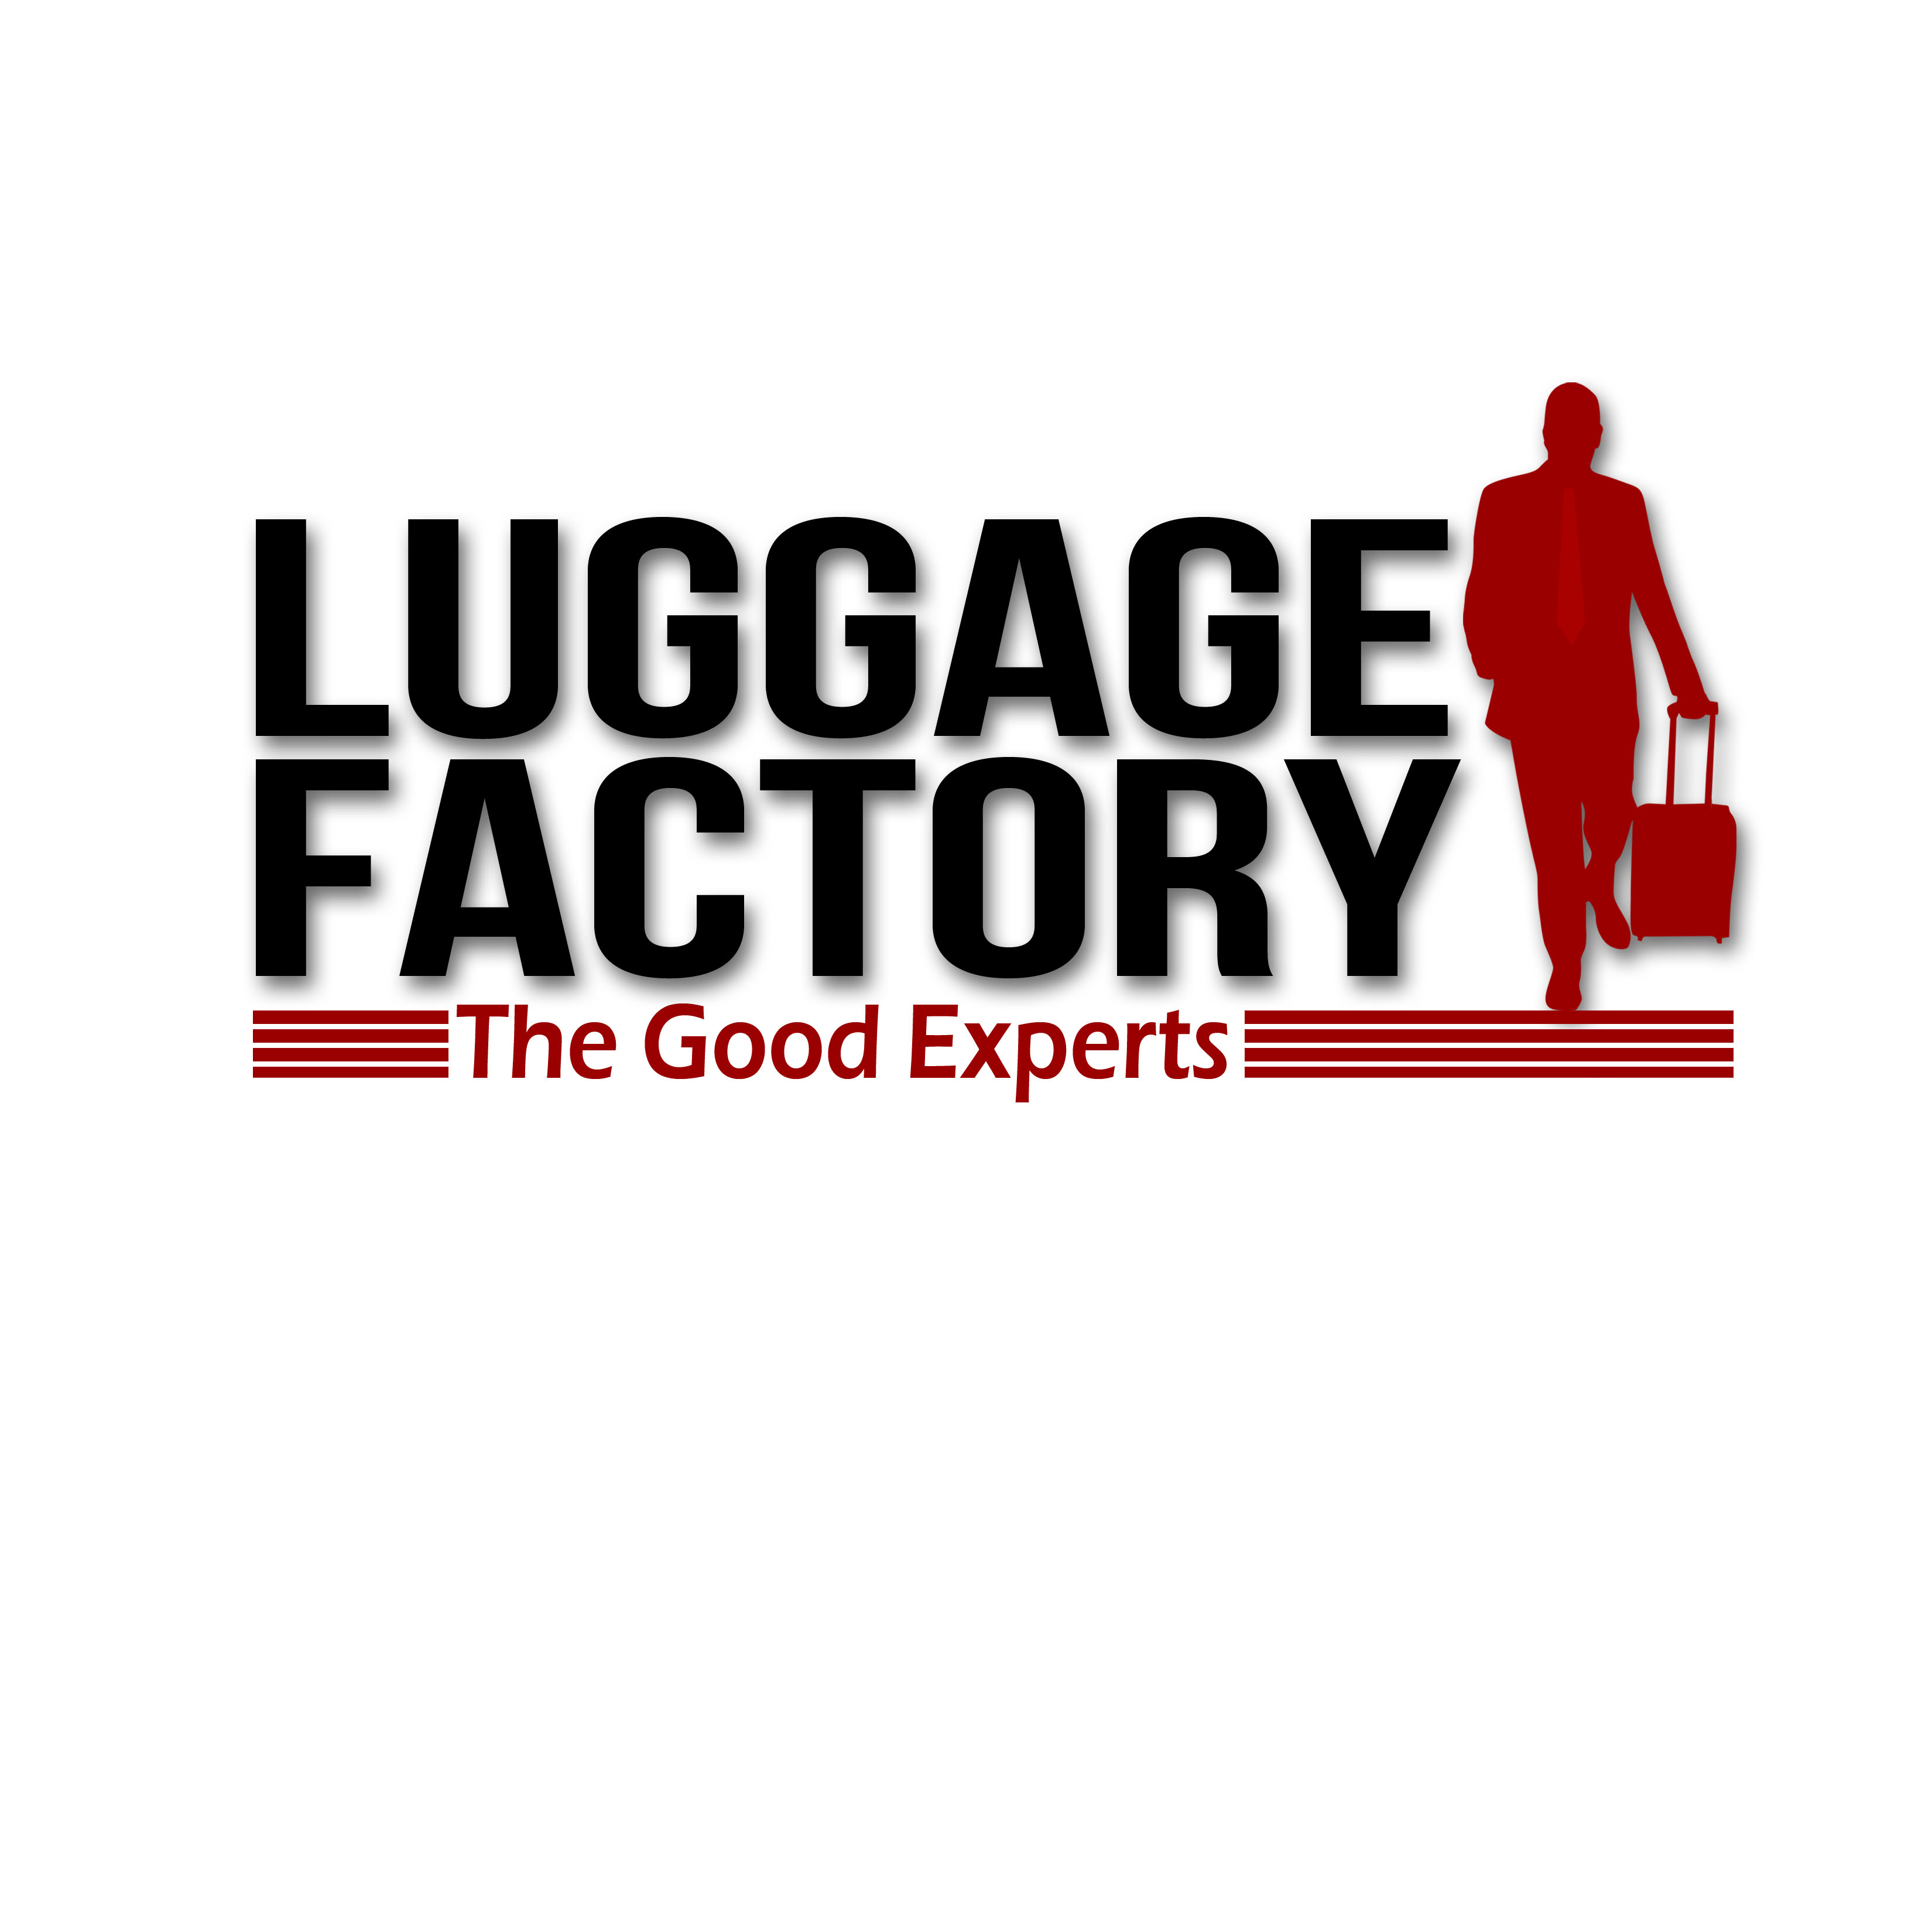 Logo Design by Allan Esclamado - Entry No. 220 in the Logo Design Contest Creative Logo Design for Luggage Factory.